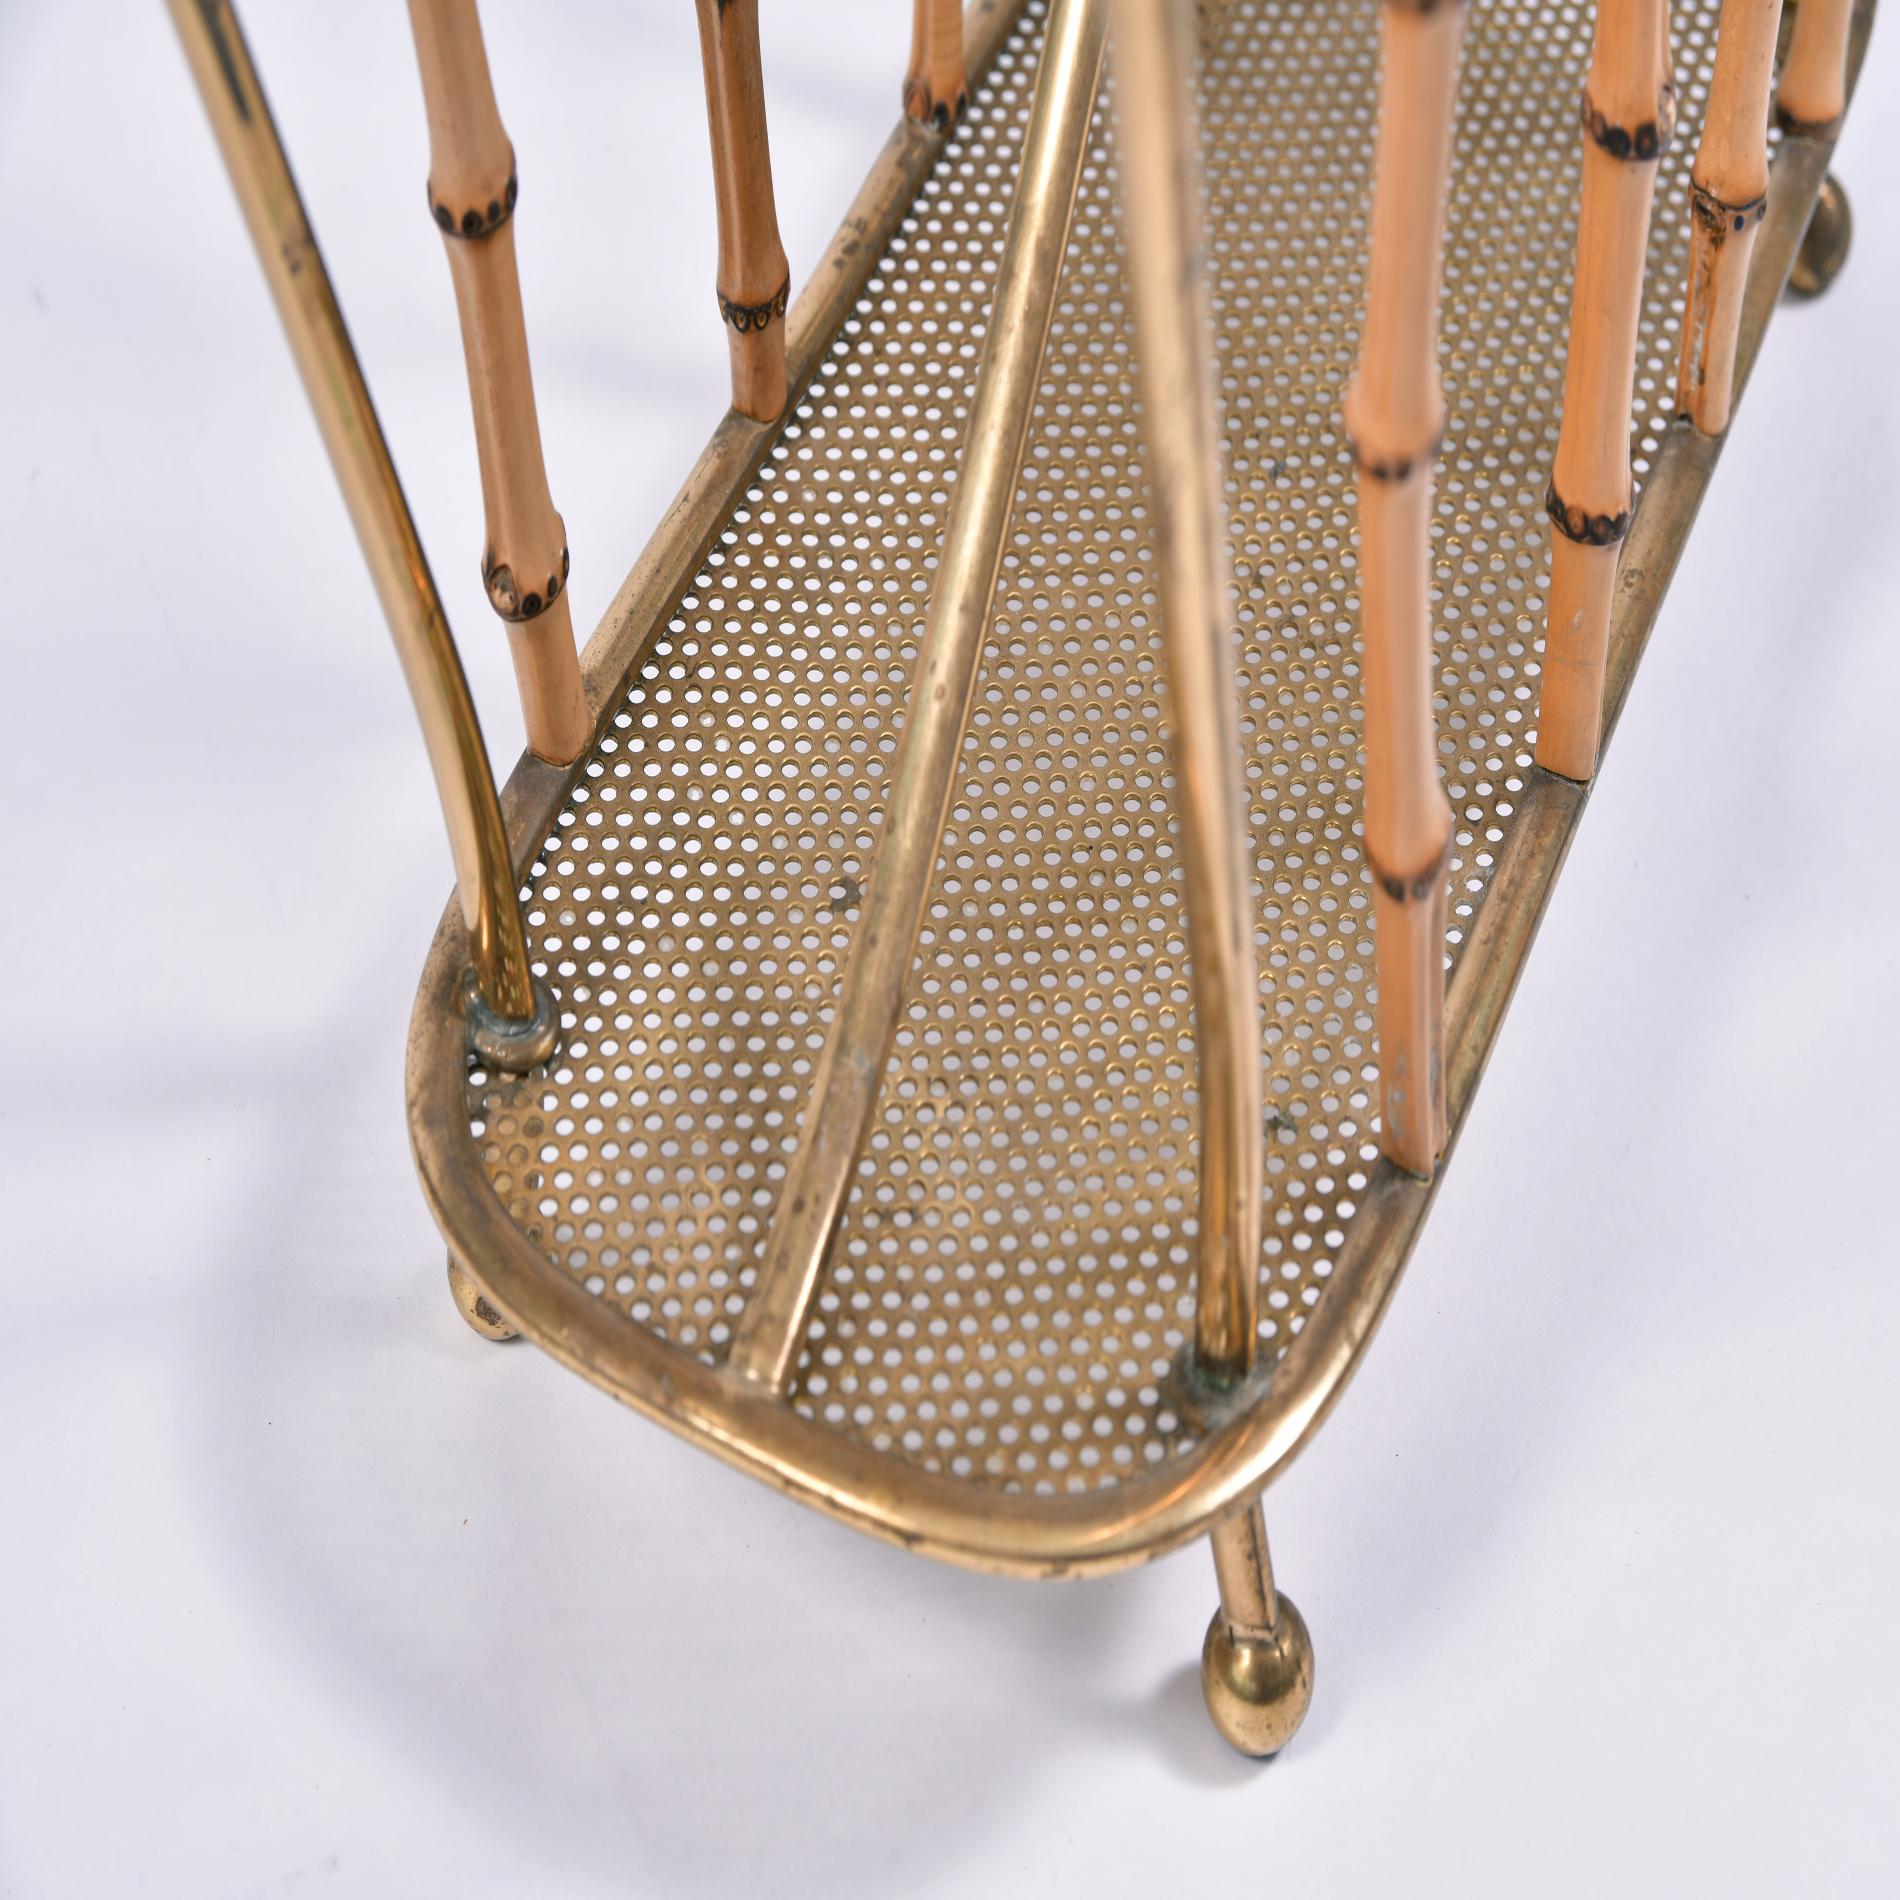 Italian Bamboo Magazine Rack 4 Final